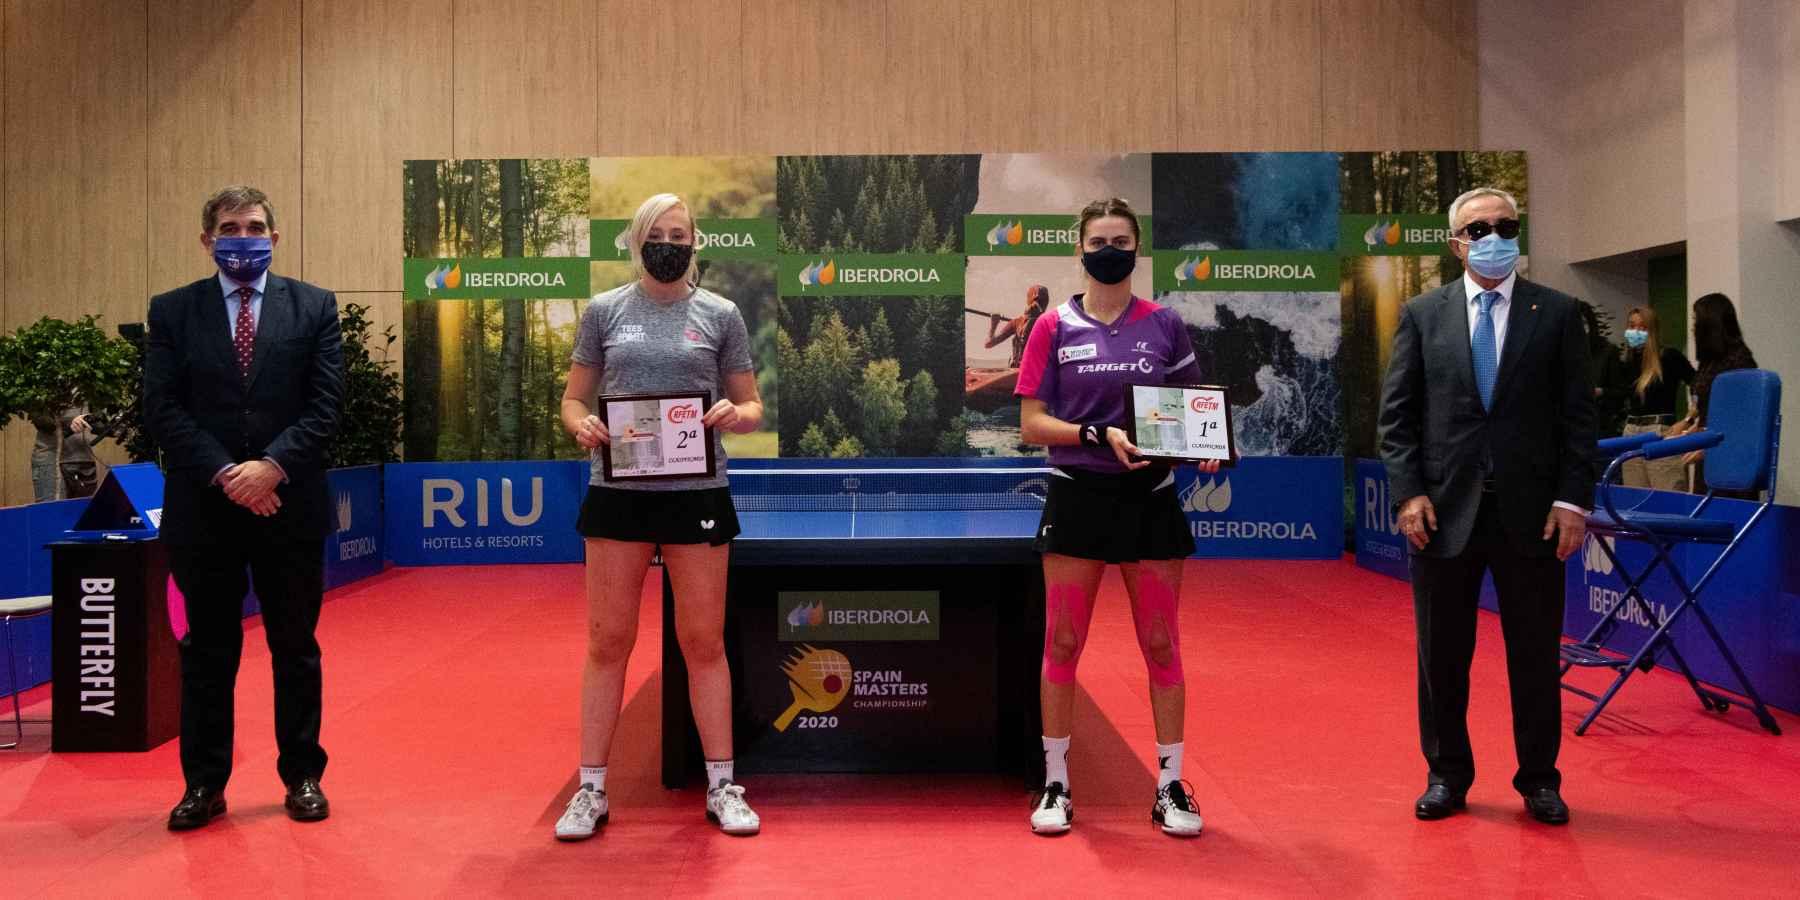 Ceremonia Iberdrola Spain Masters 2020